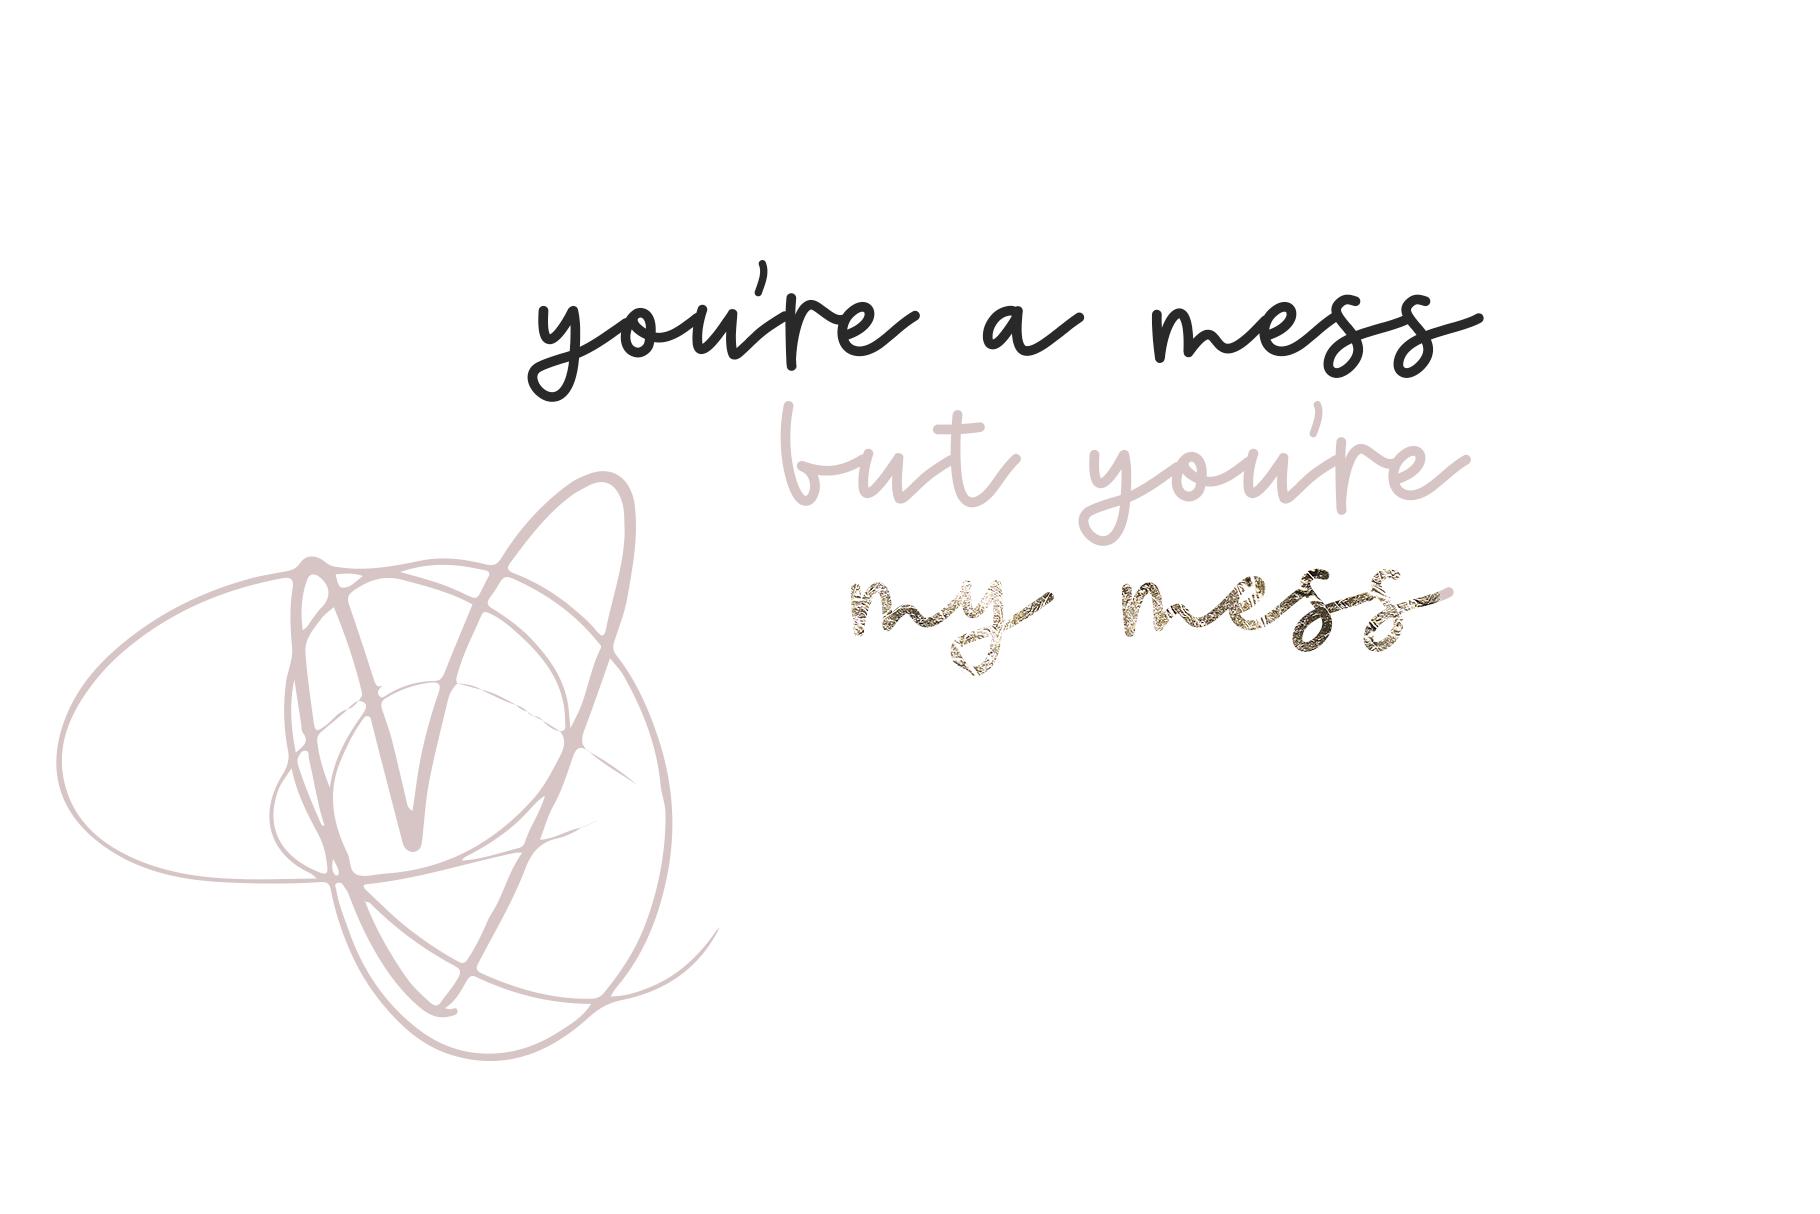 Sweetheart - A Handwritten Script Font & Doodles example image 8